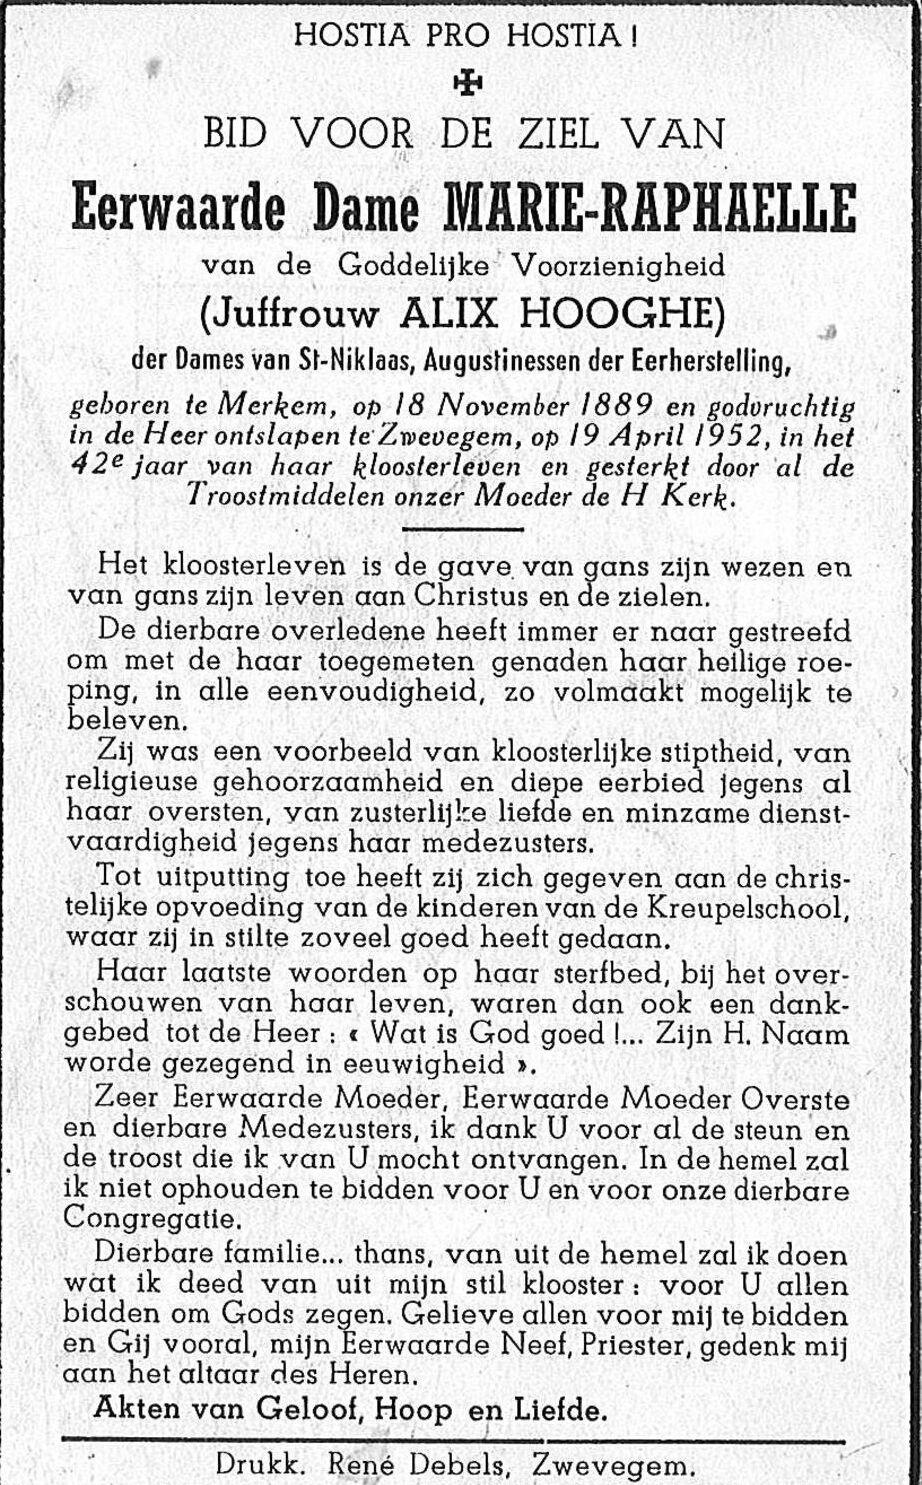 Alix Hooghe